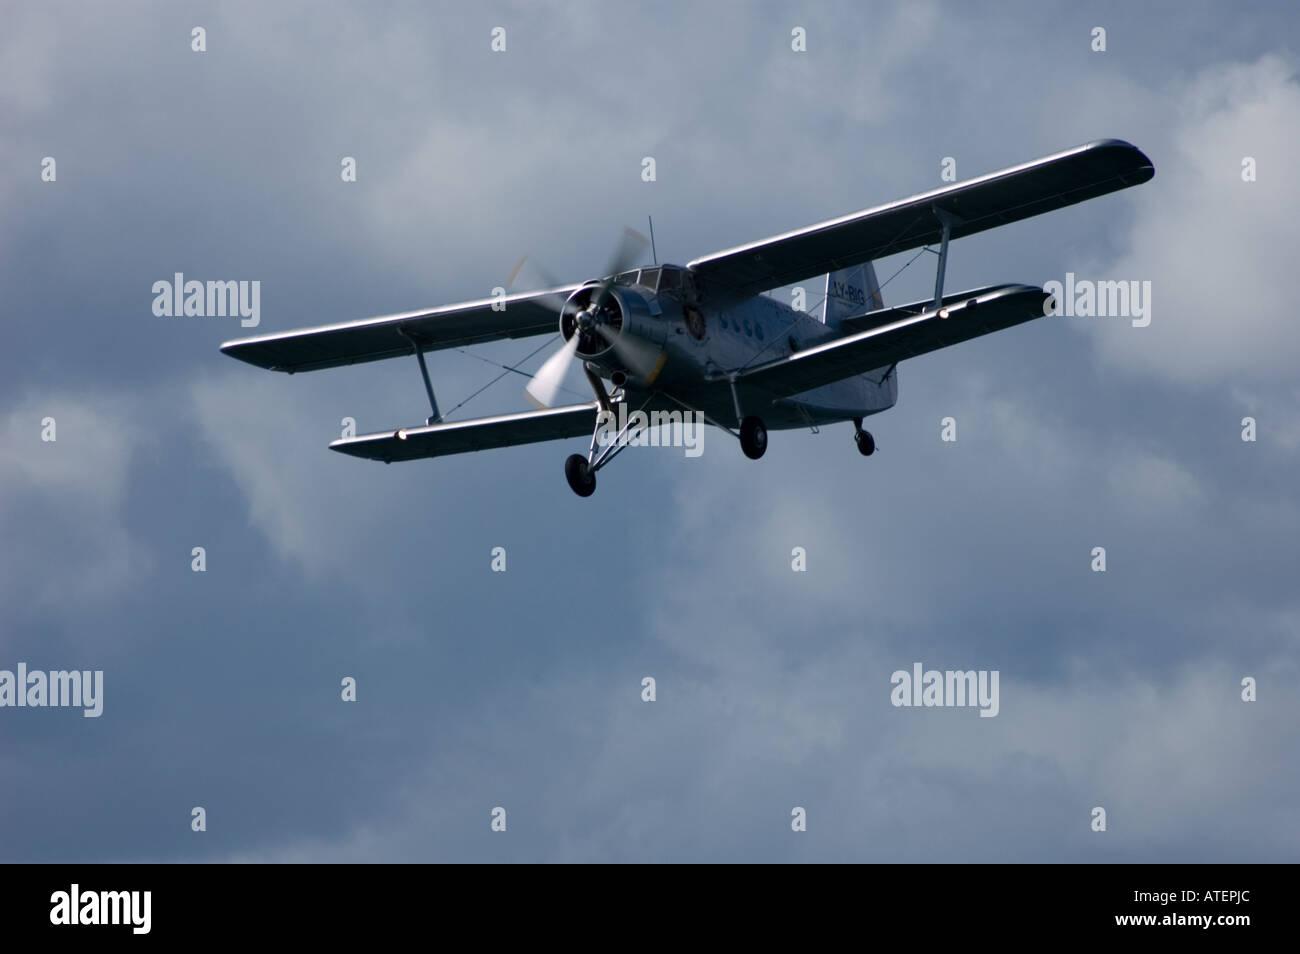 Biplano Antonov Immagini Stock